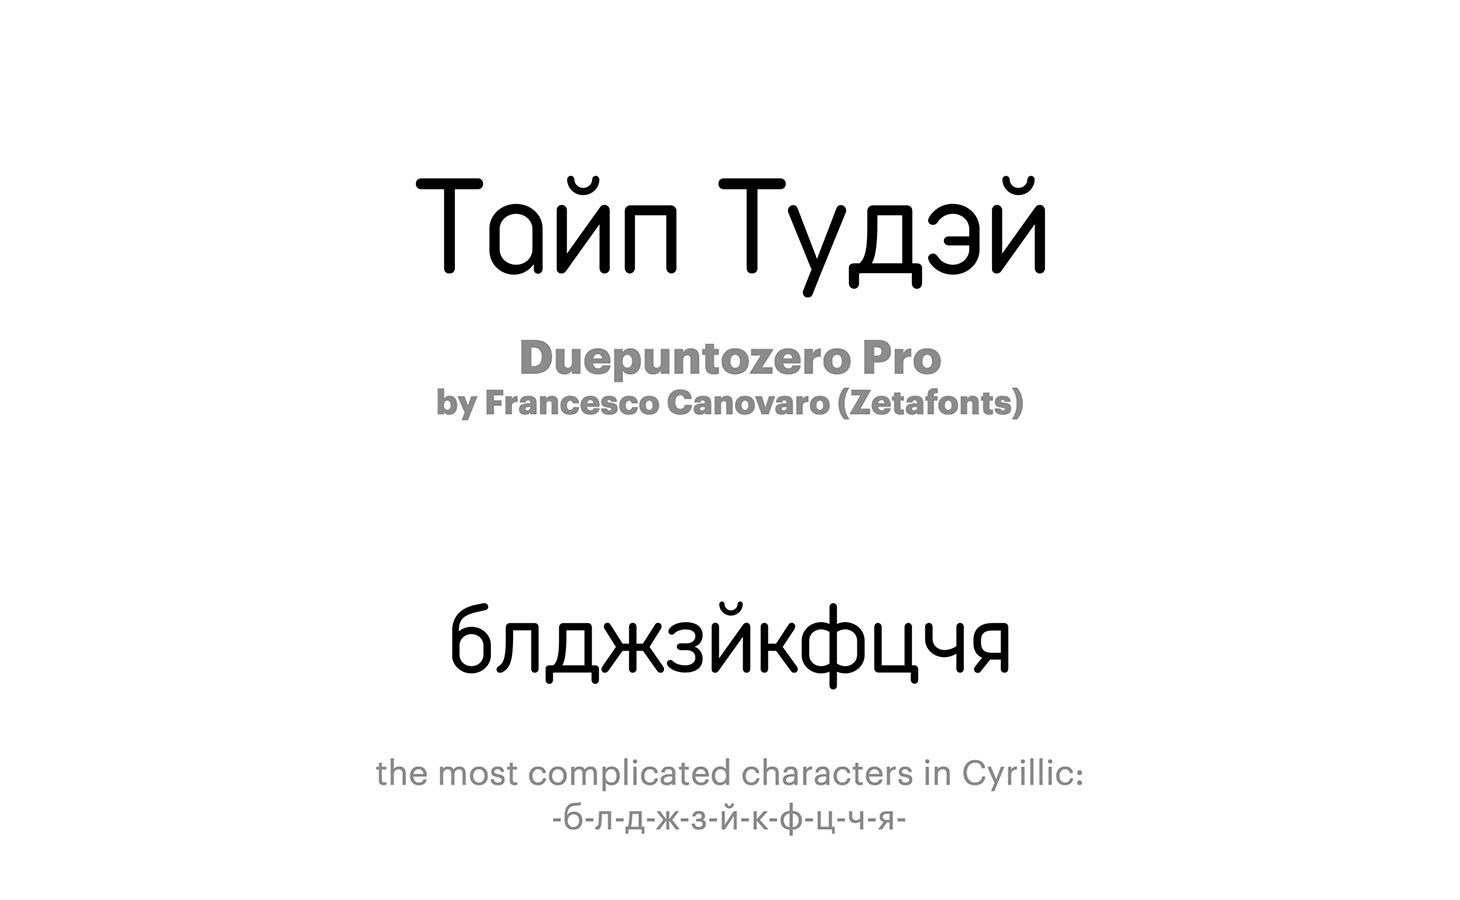 Duepuntozero-Pro